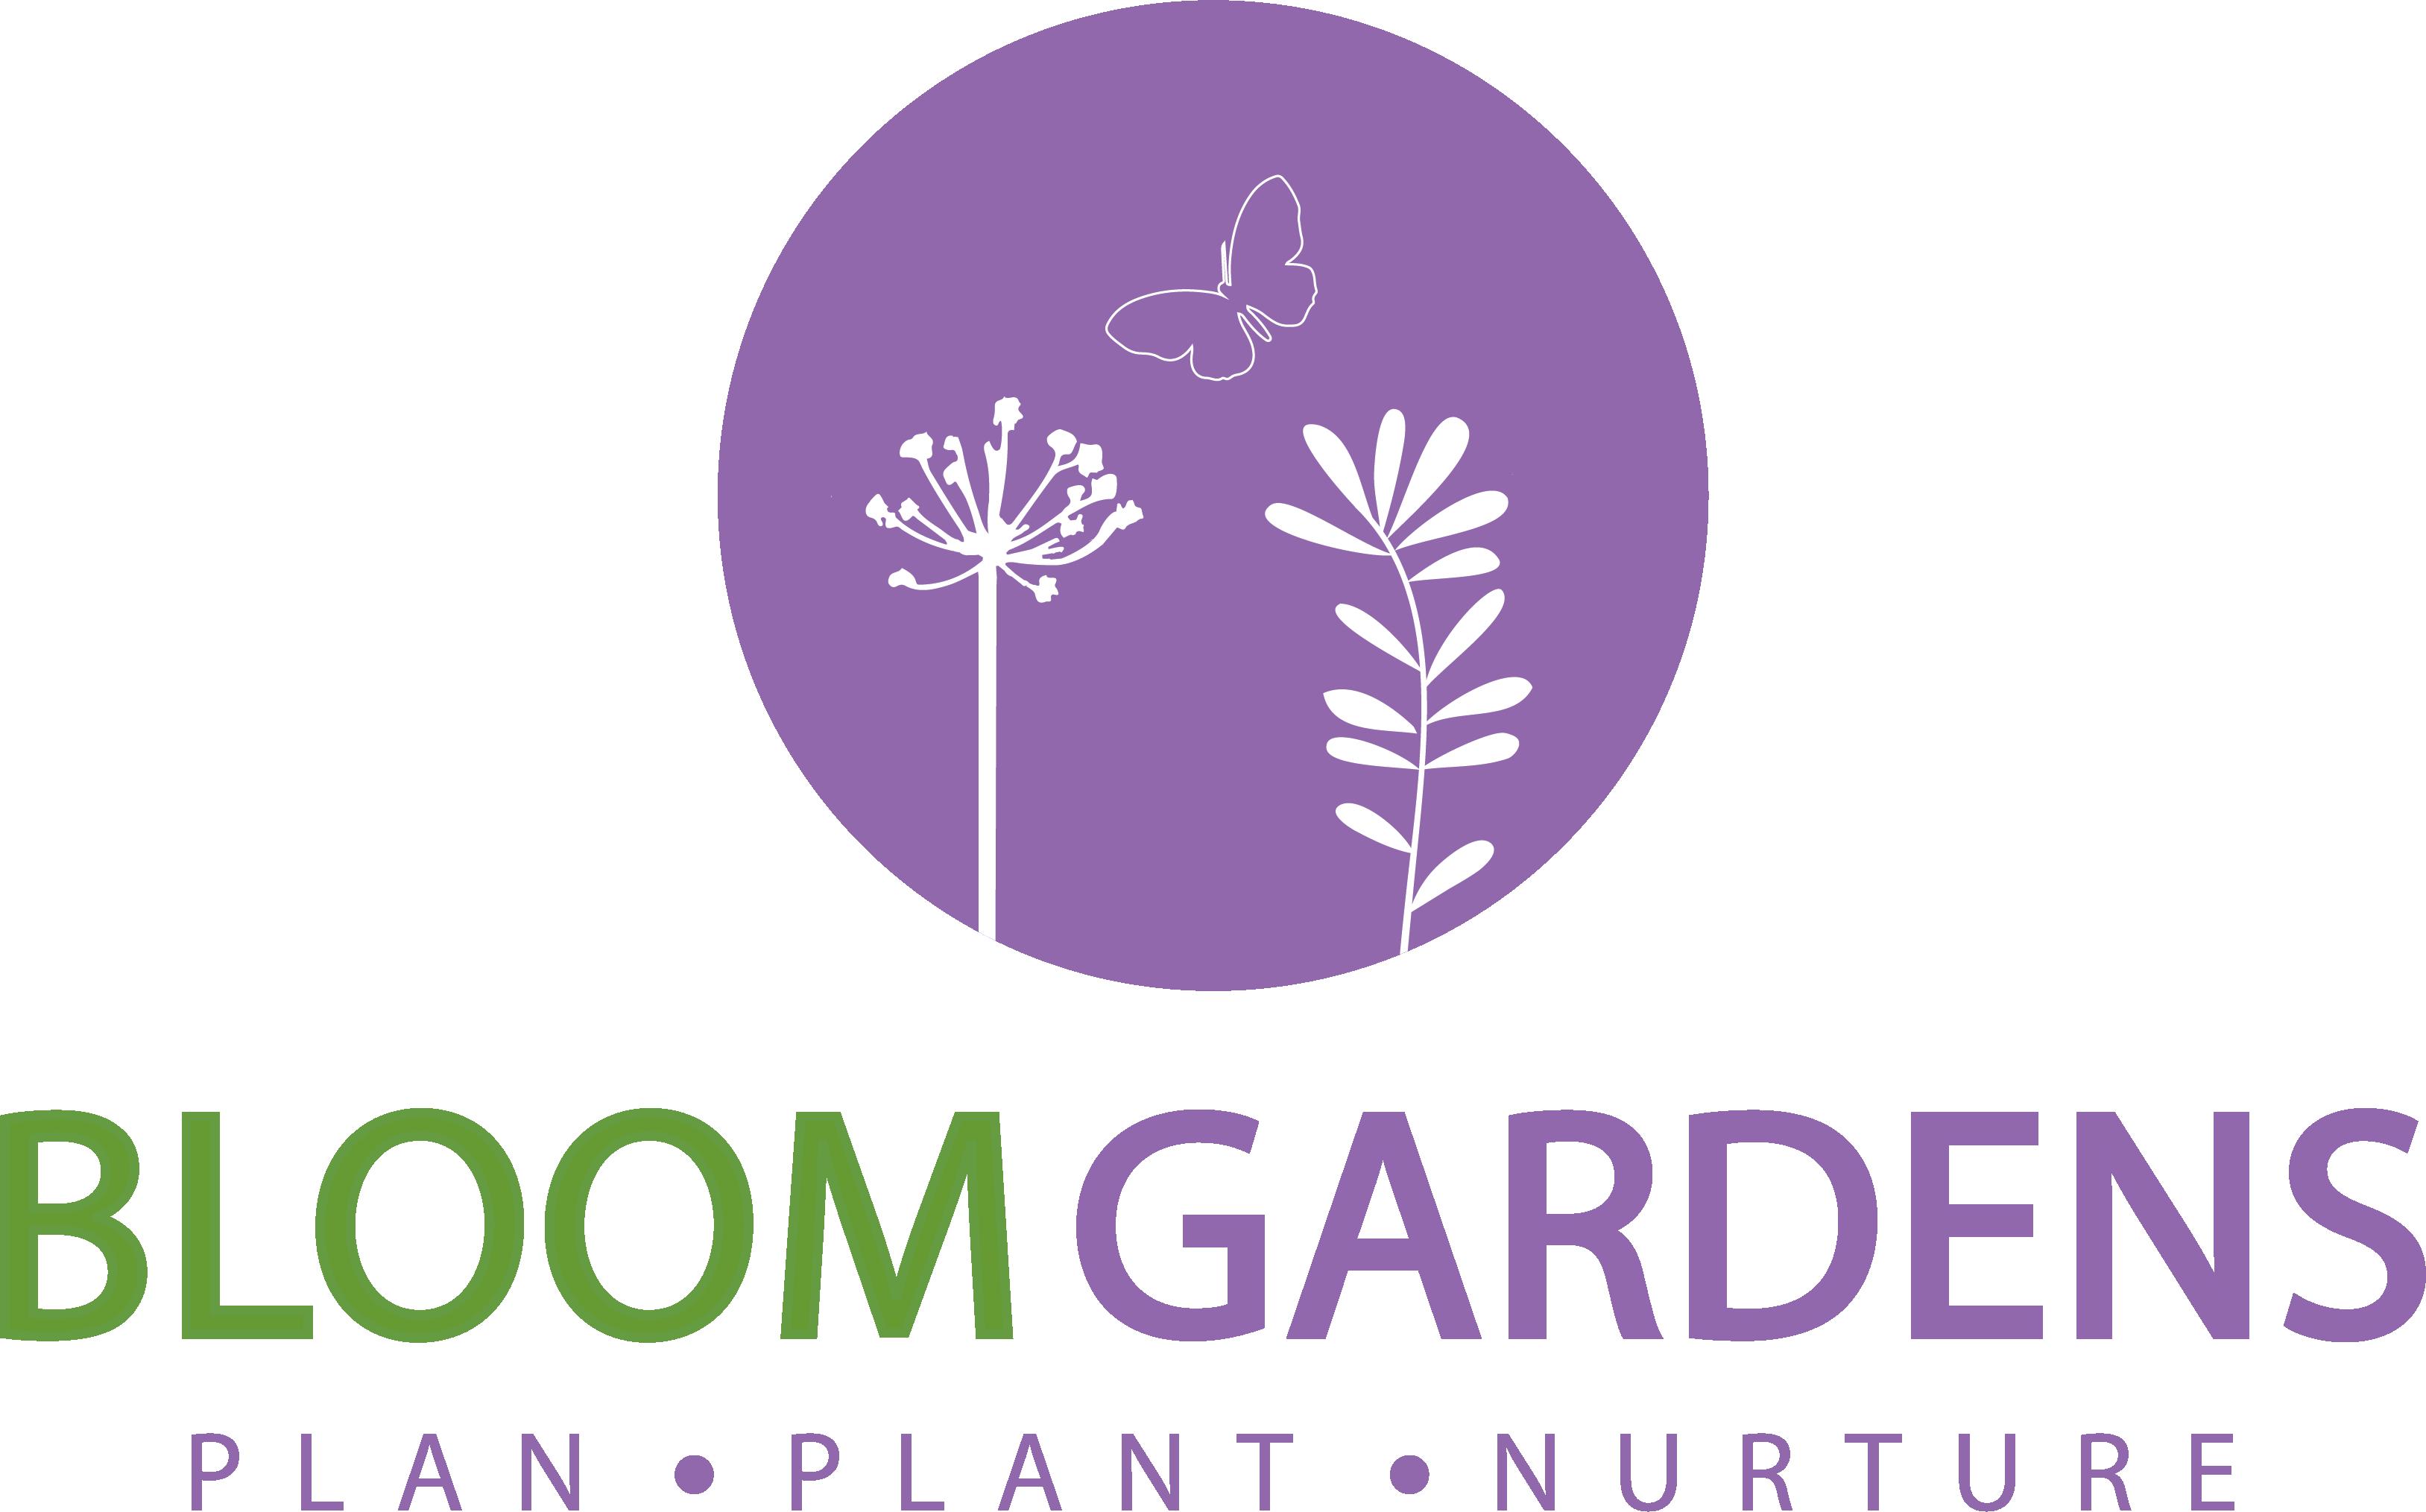 Bloom Gardens